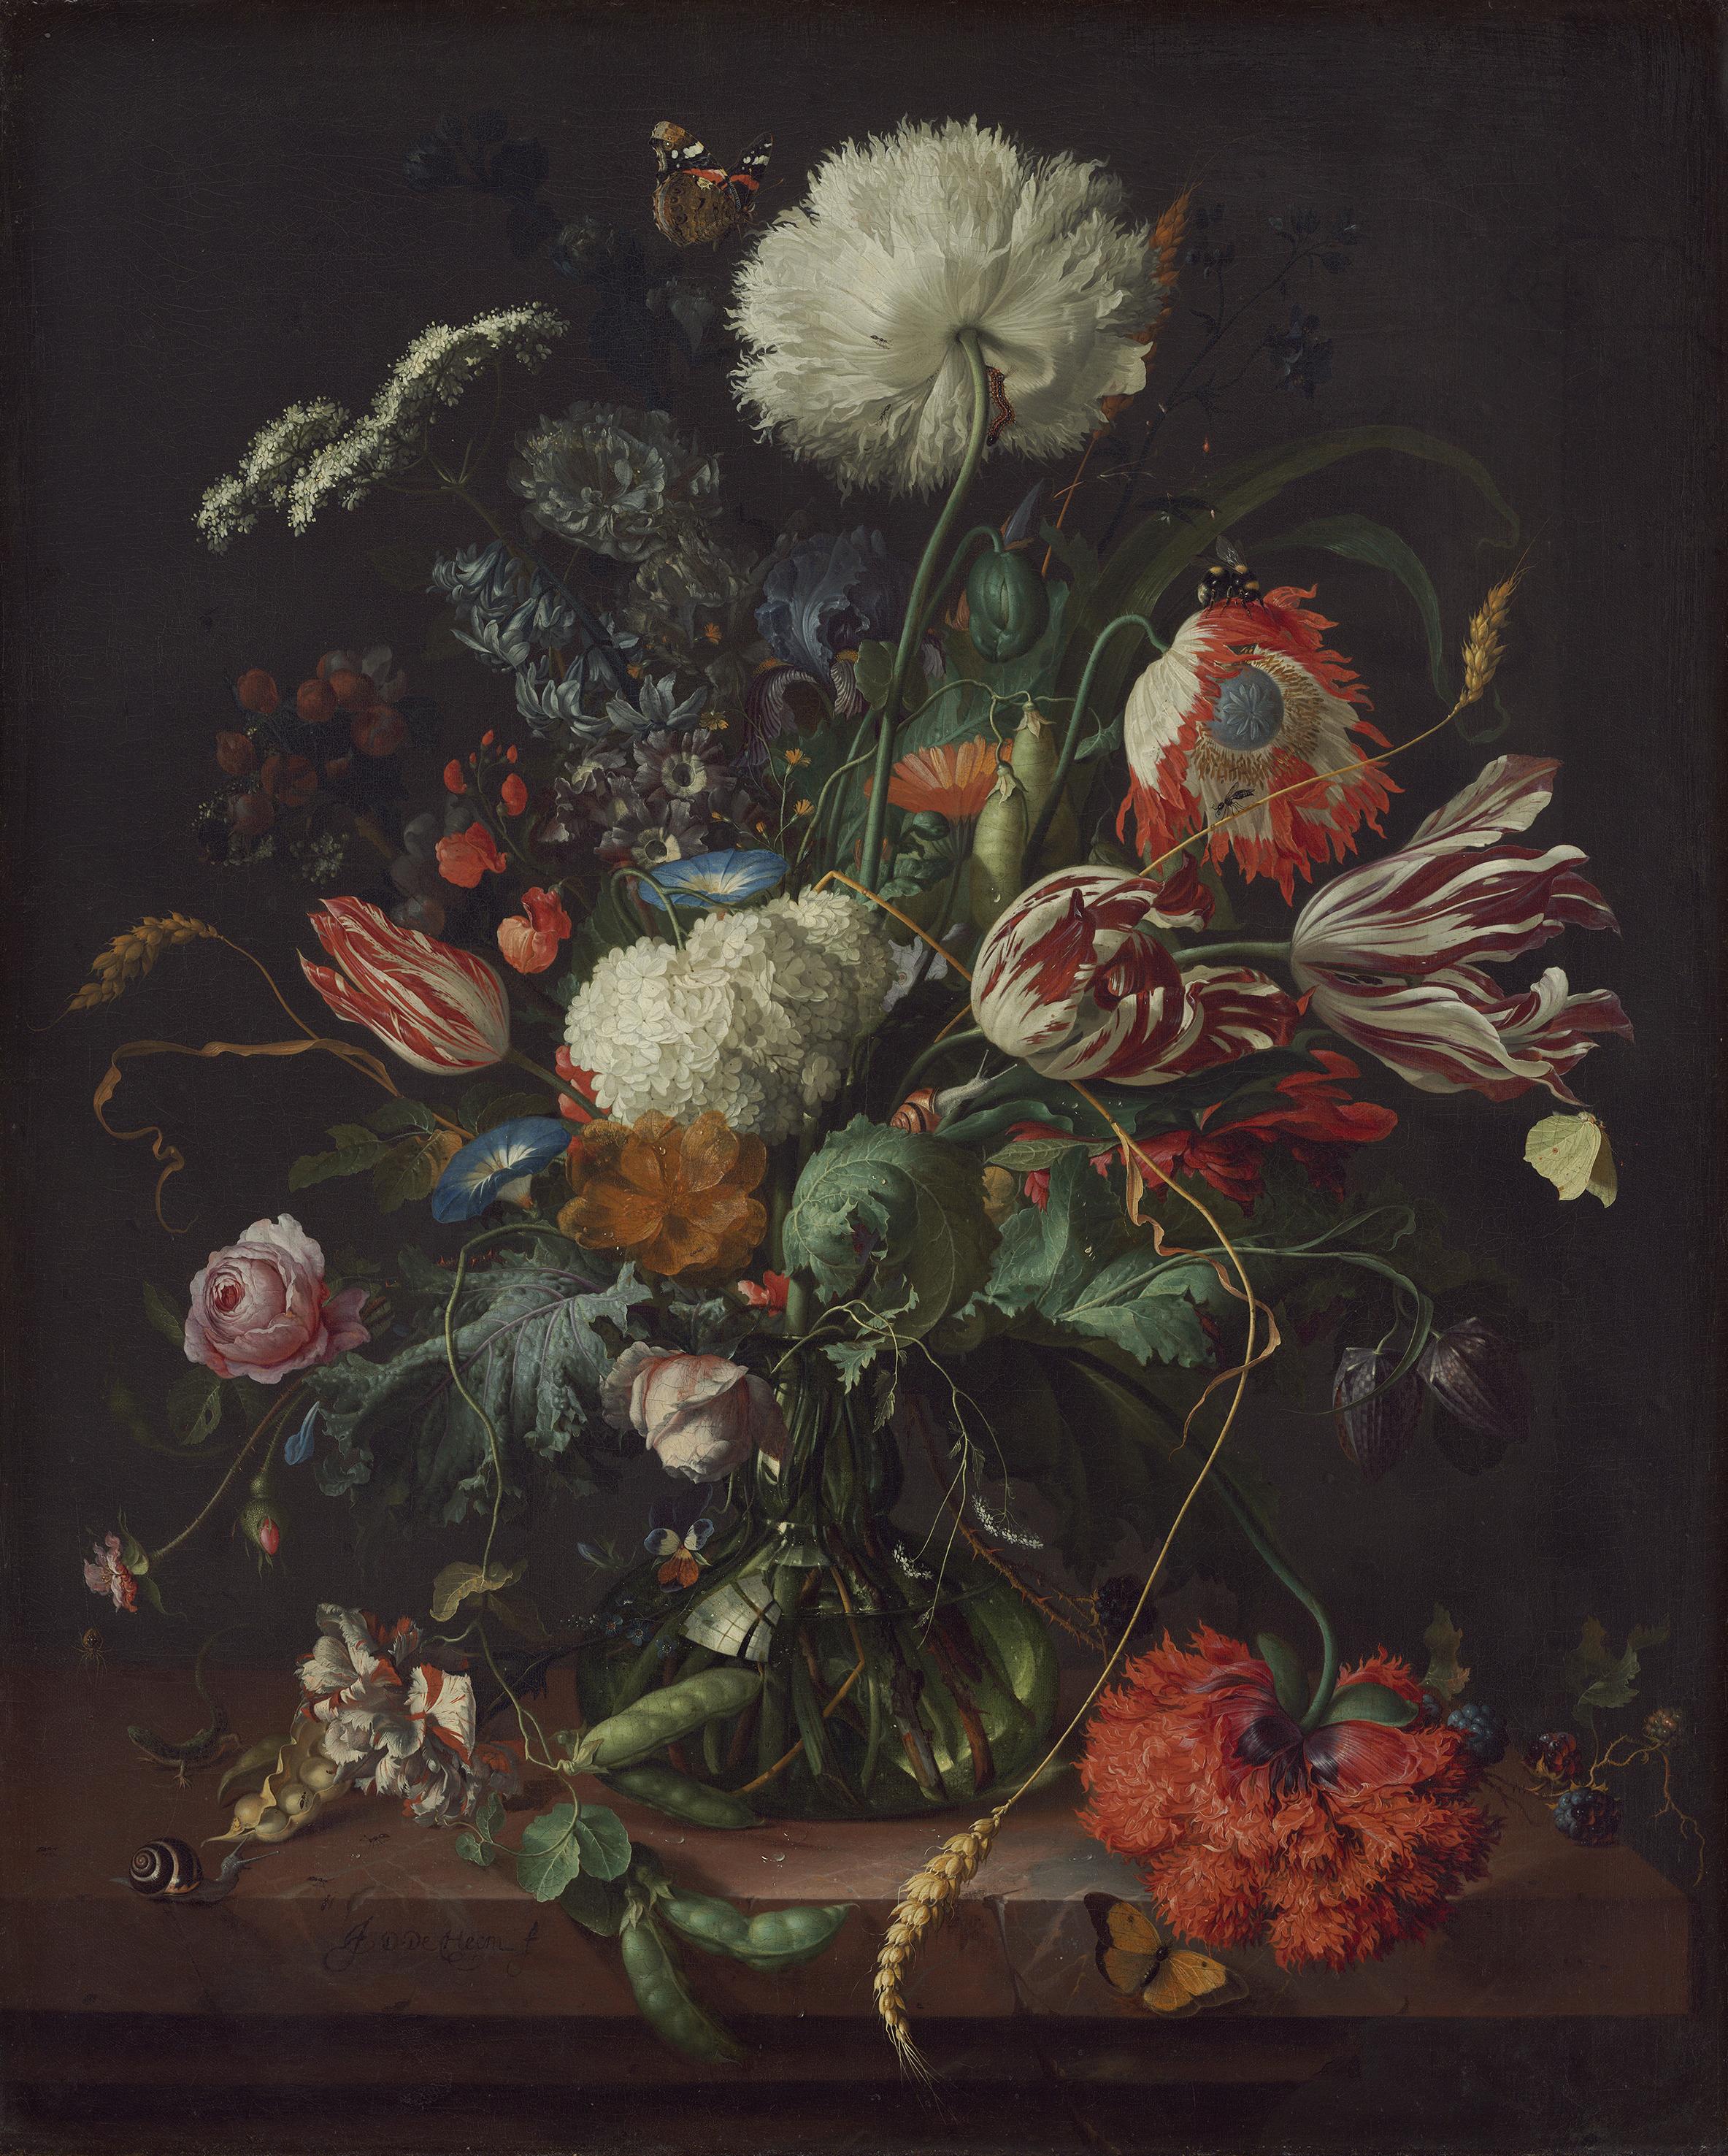 Filejan davidsz de heem vase of flowers wga11277g filejan davidsz de heem vase of flowers wga11277g reviewsmspy